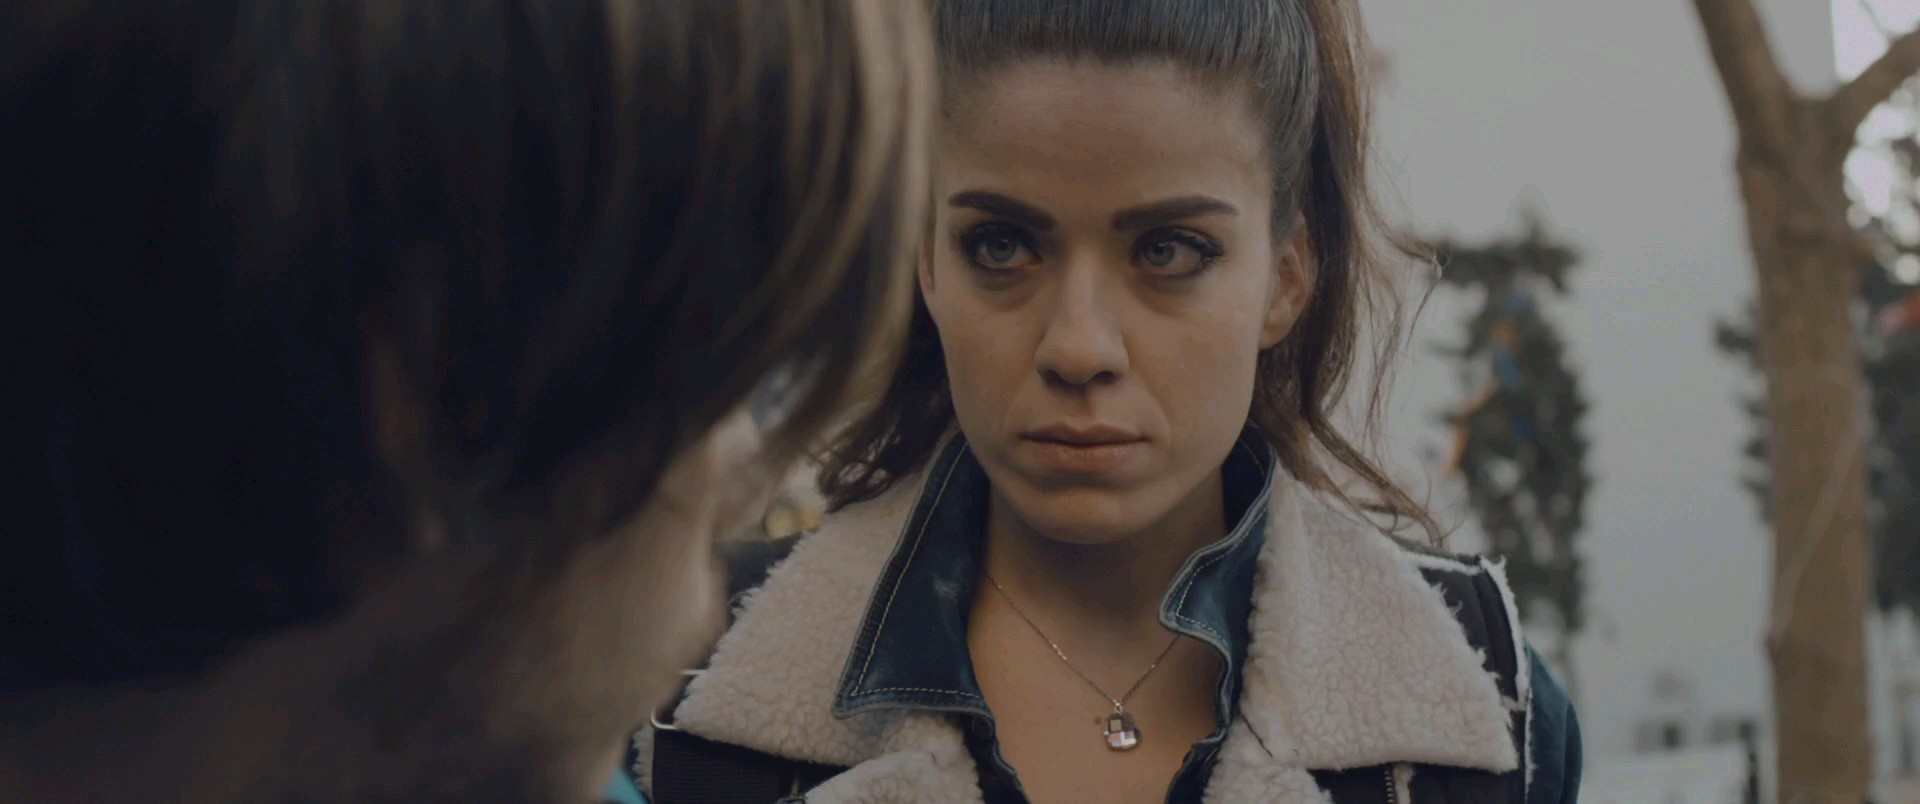 Çekmeköy Underground 2015 WEB-DL m720p Mkv Yerli Film - Tek Link indir